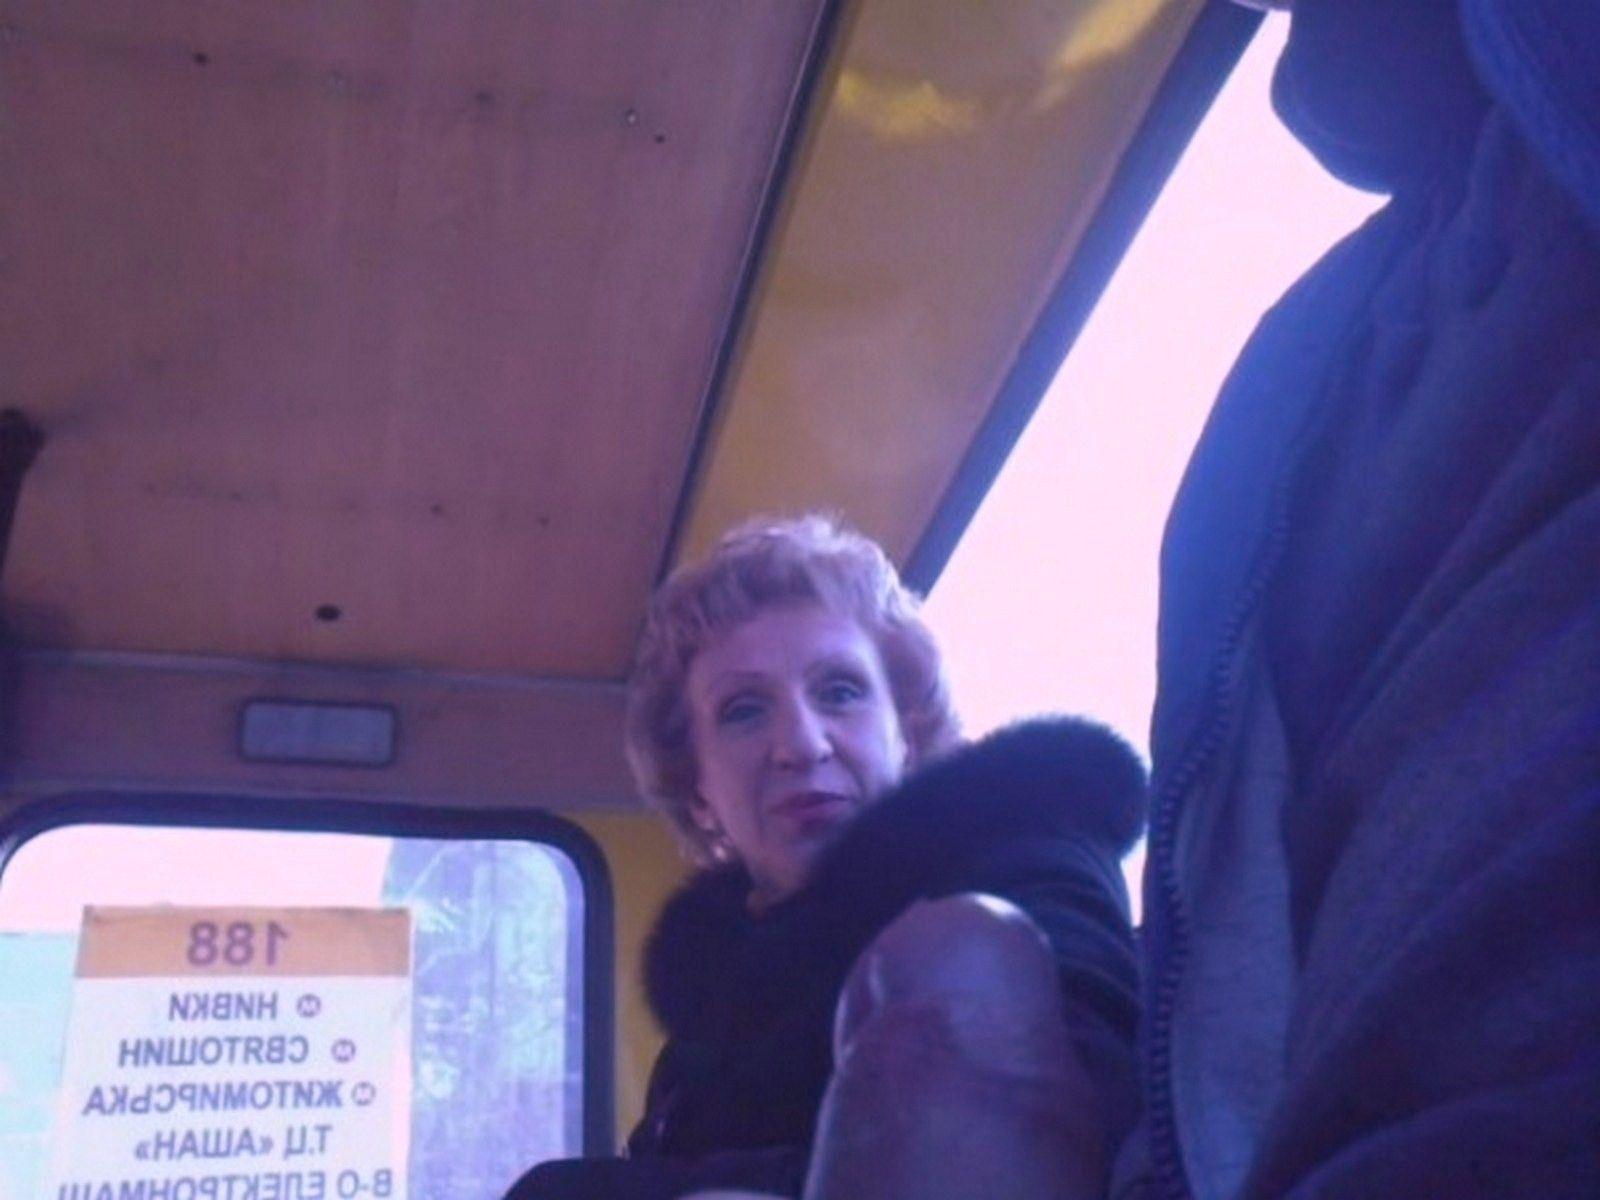 Лапают в автобусе девушку два извращенца фото 240-18